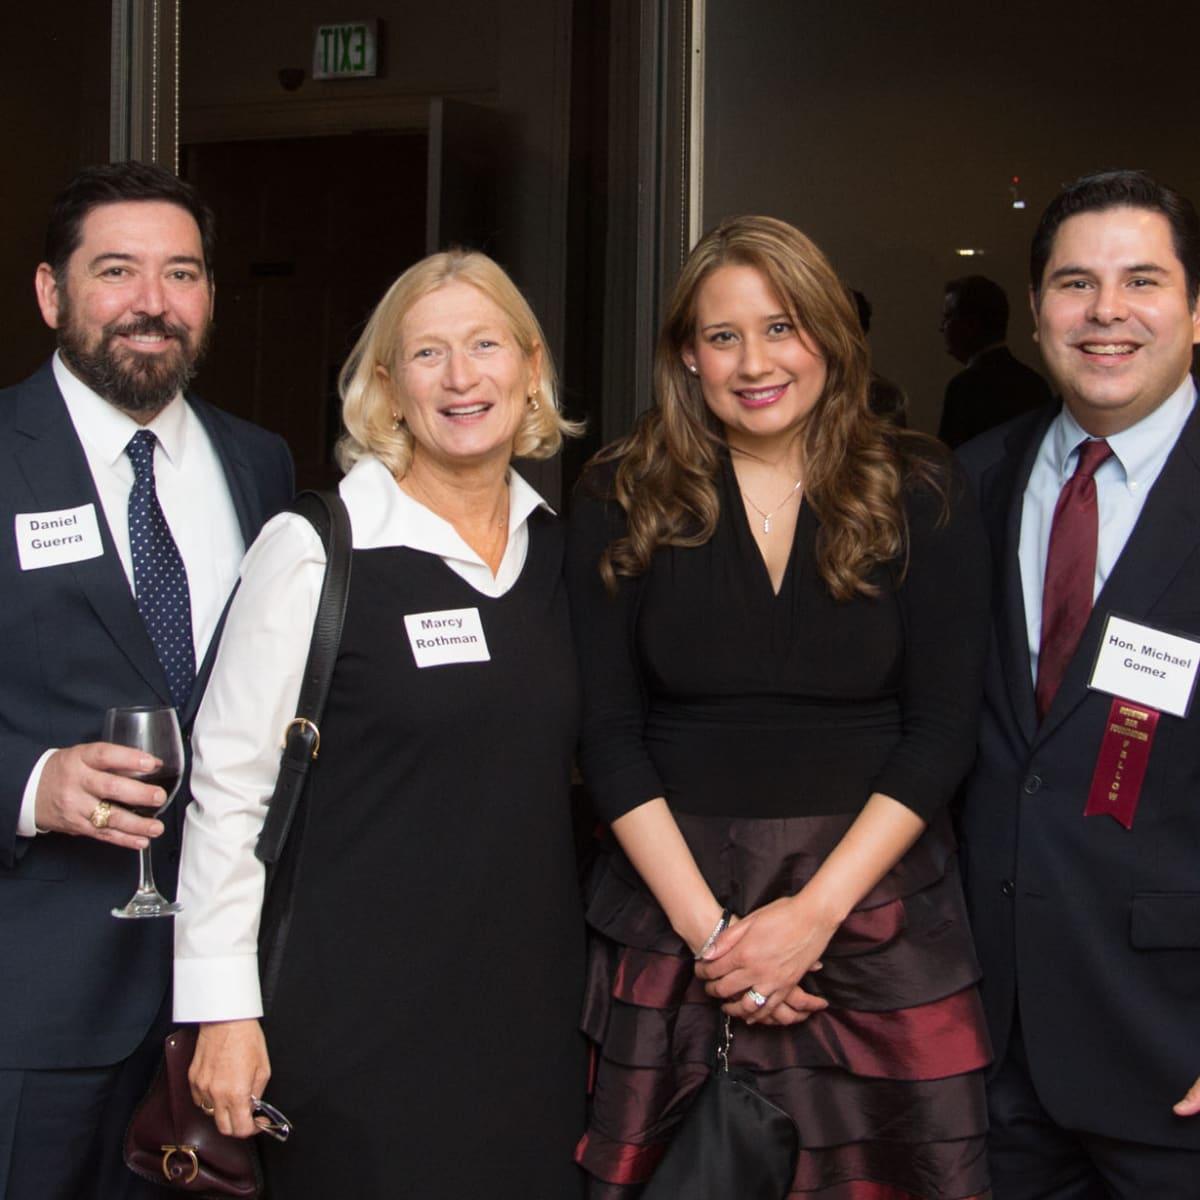 News, Shelby, Houston Bar Harvest Party, Daniel Guerra, Marcy Rothman, Diana Gomez and Judge Michael Gomez